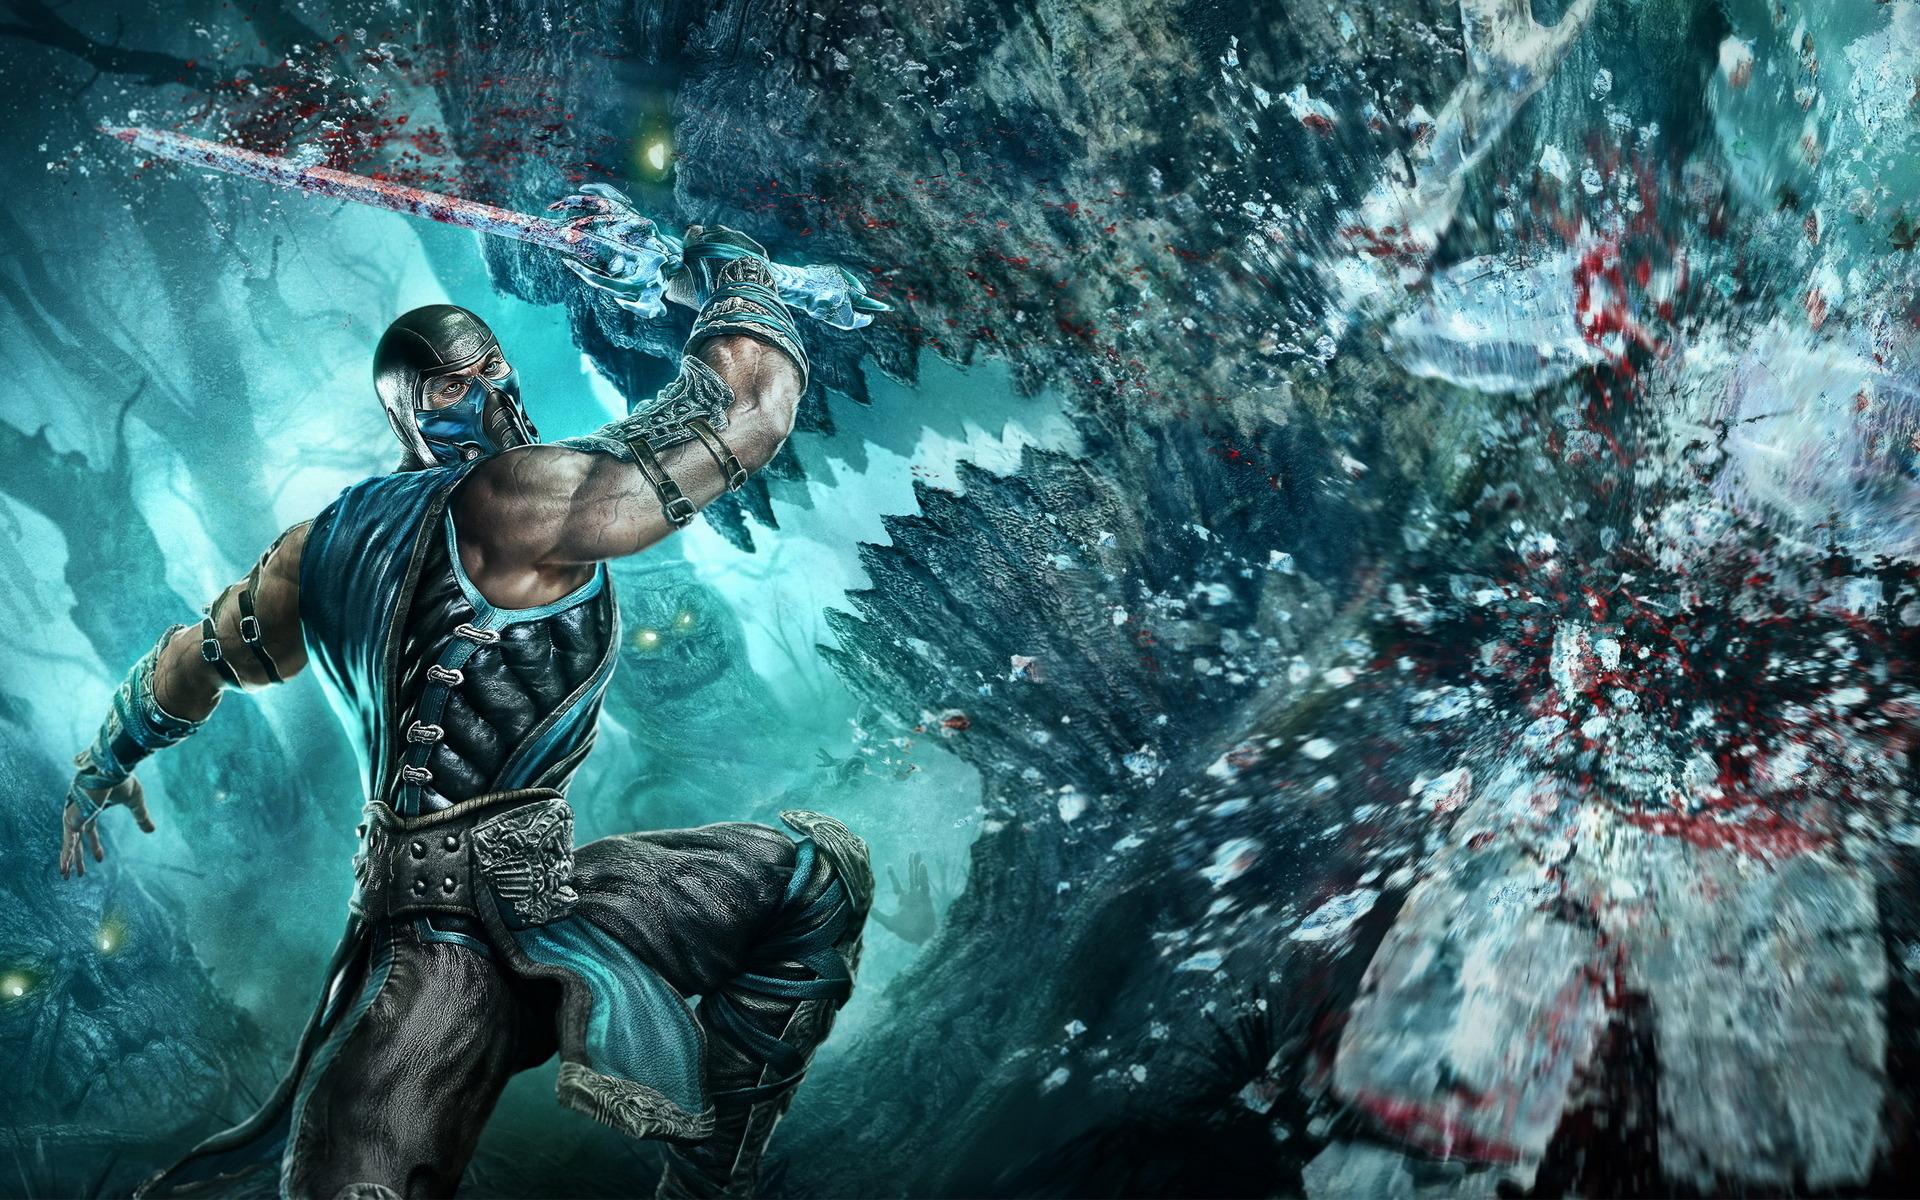 Tags Anime Mortal Kombat Sub Zero Wallpaper